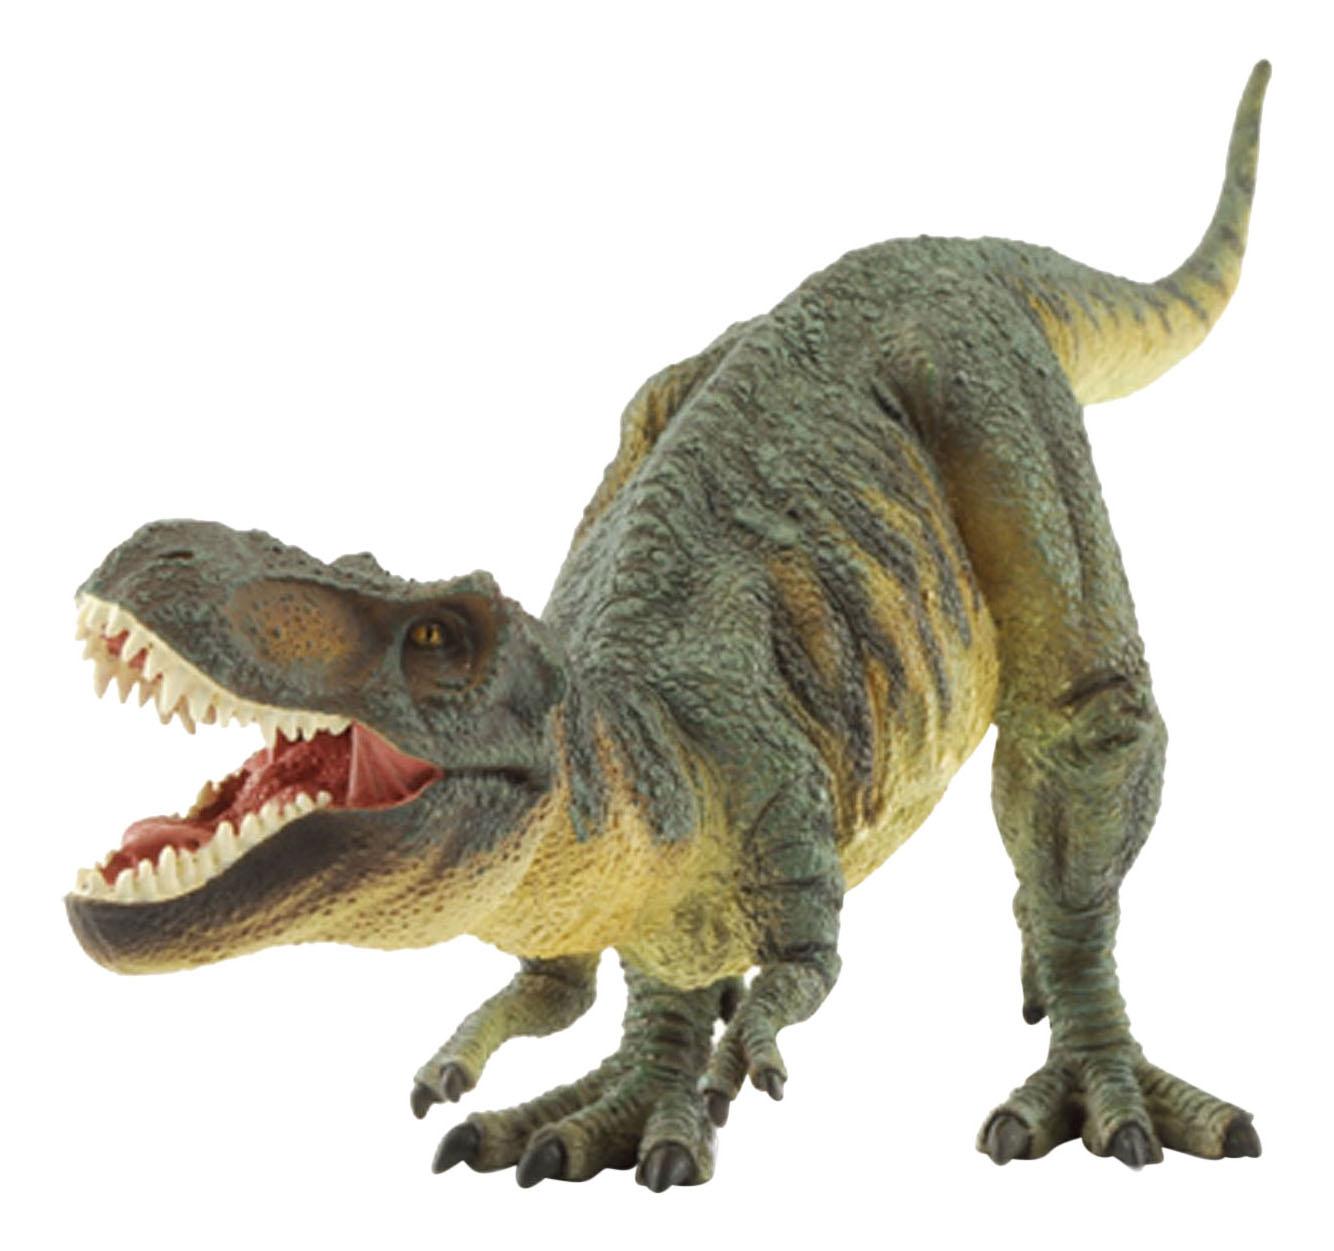 динозавры фигурки картинки насчет виза или